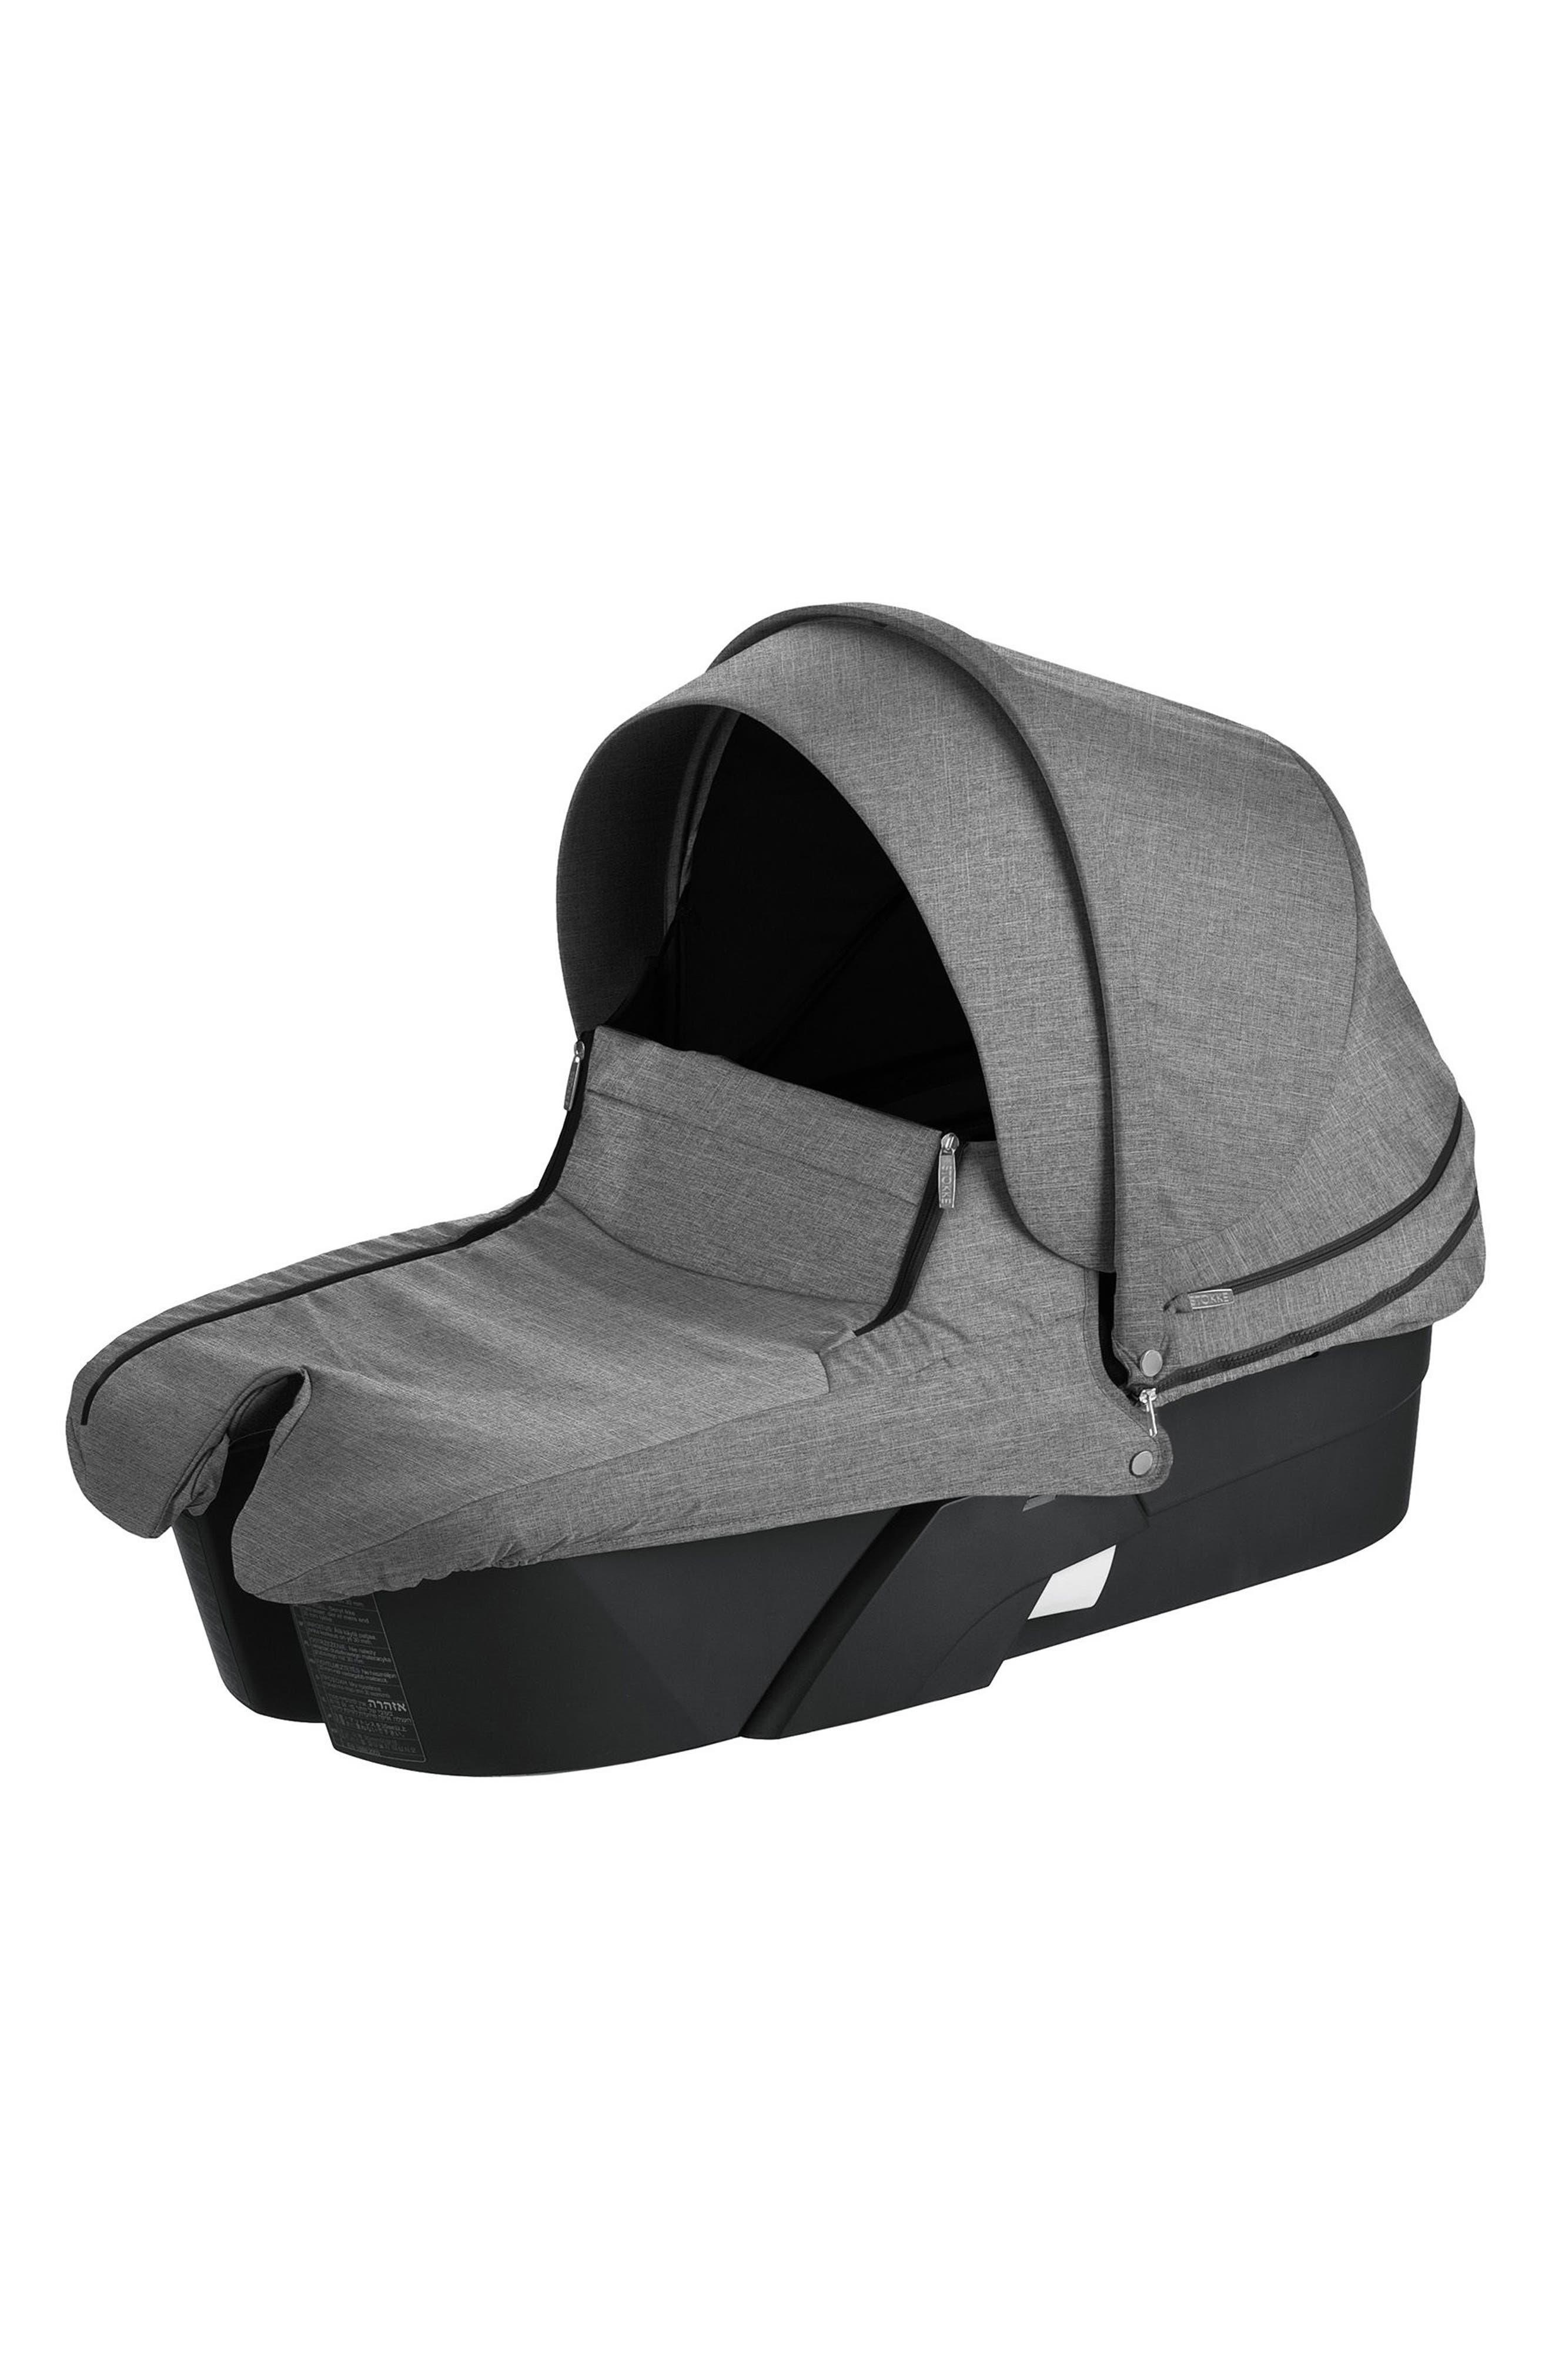 STOKKE Xplory<sup>®</sup> Black Frame Stroller Carry Cot, Main, color, 001